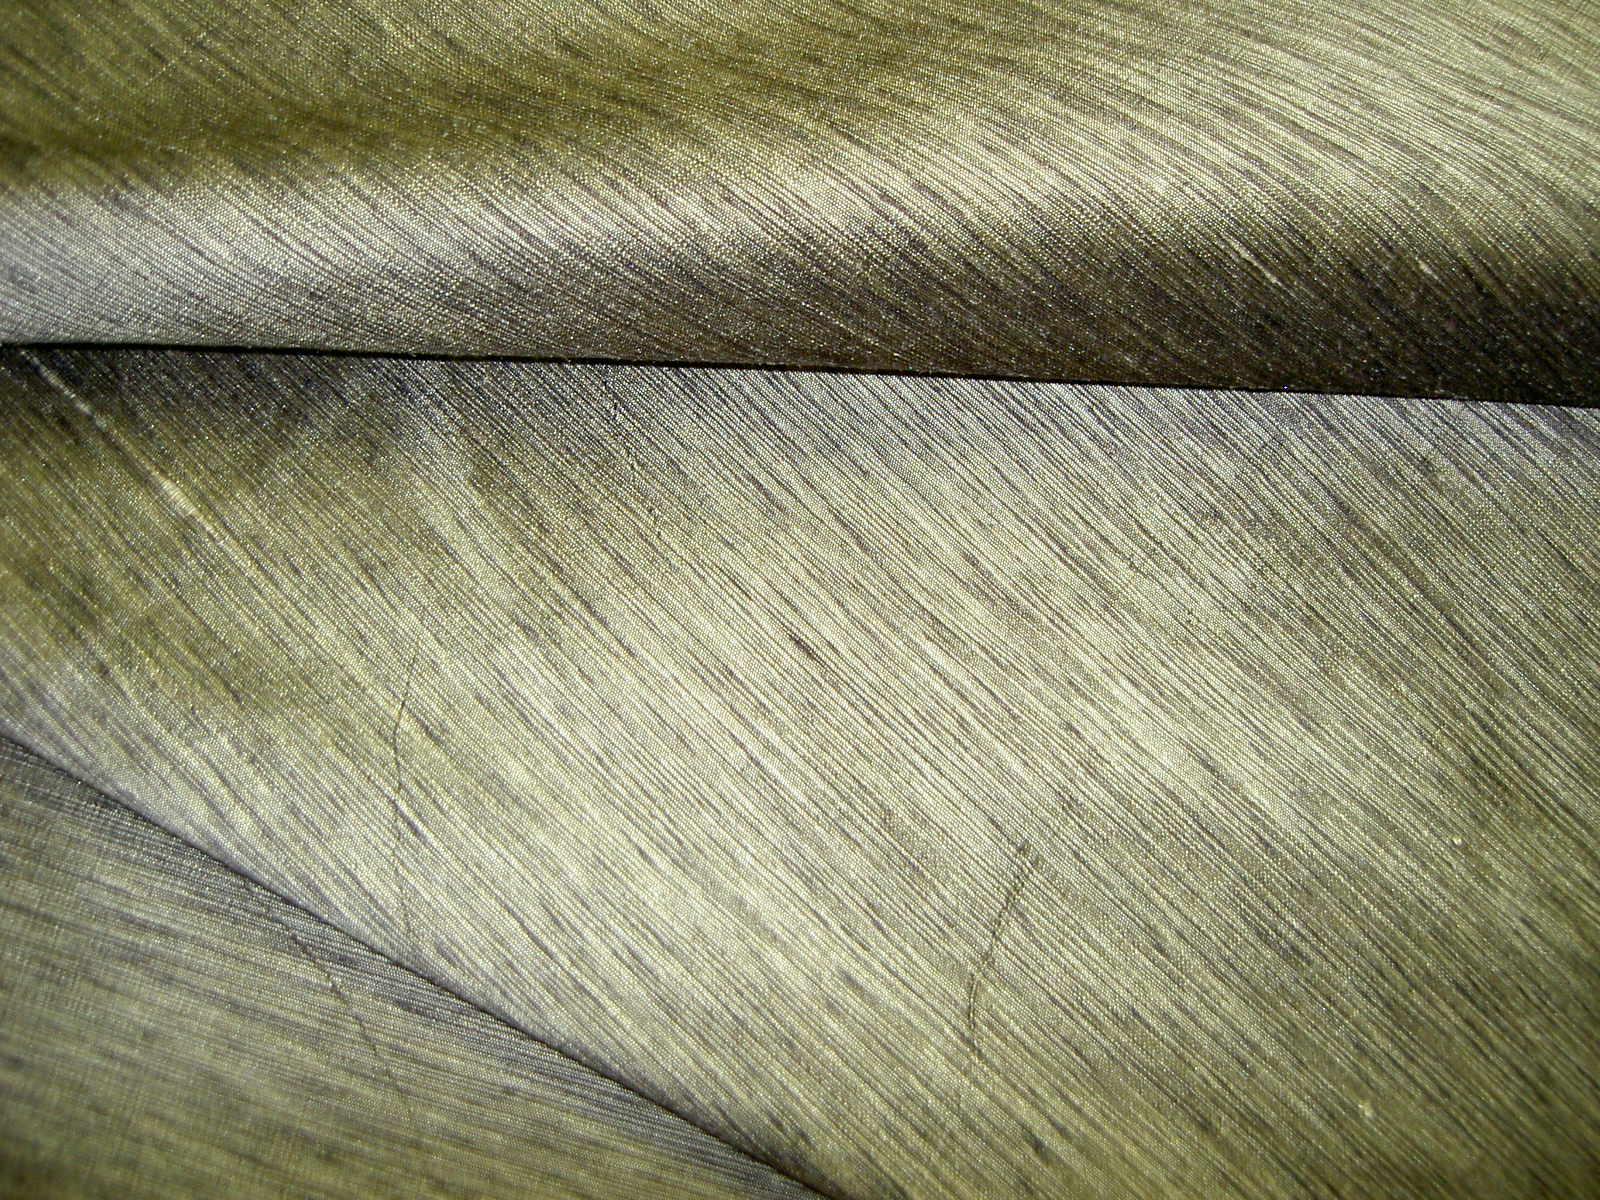 raw silk window treatment drapery home decor fabric indian ocean